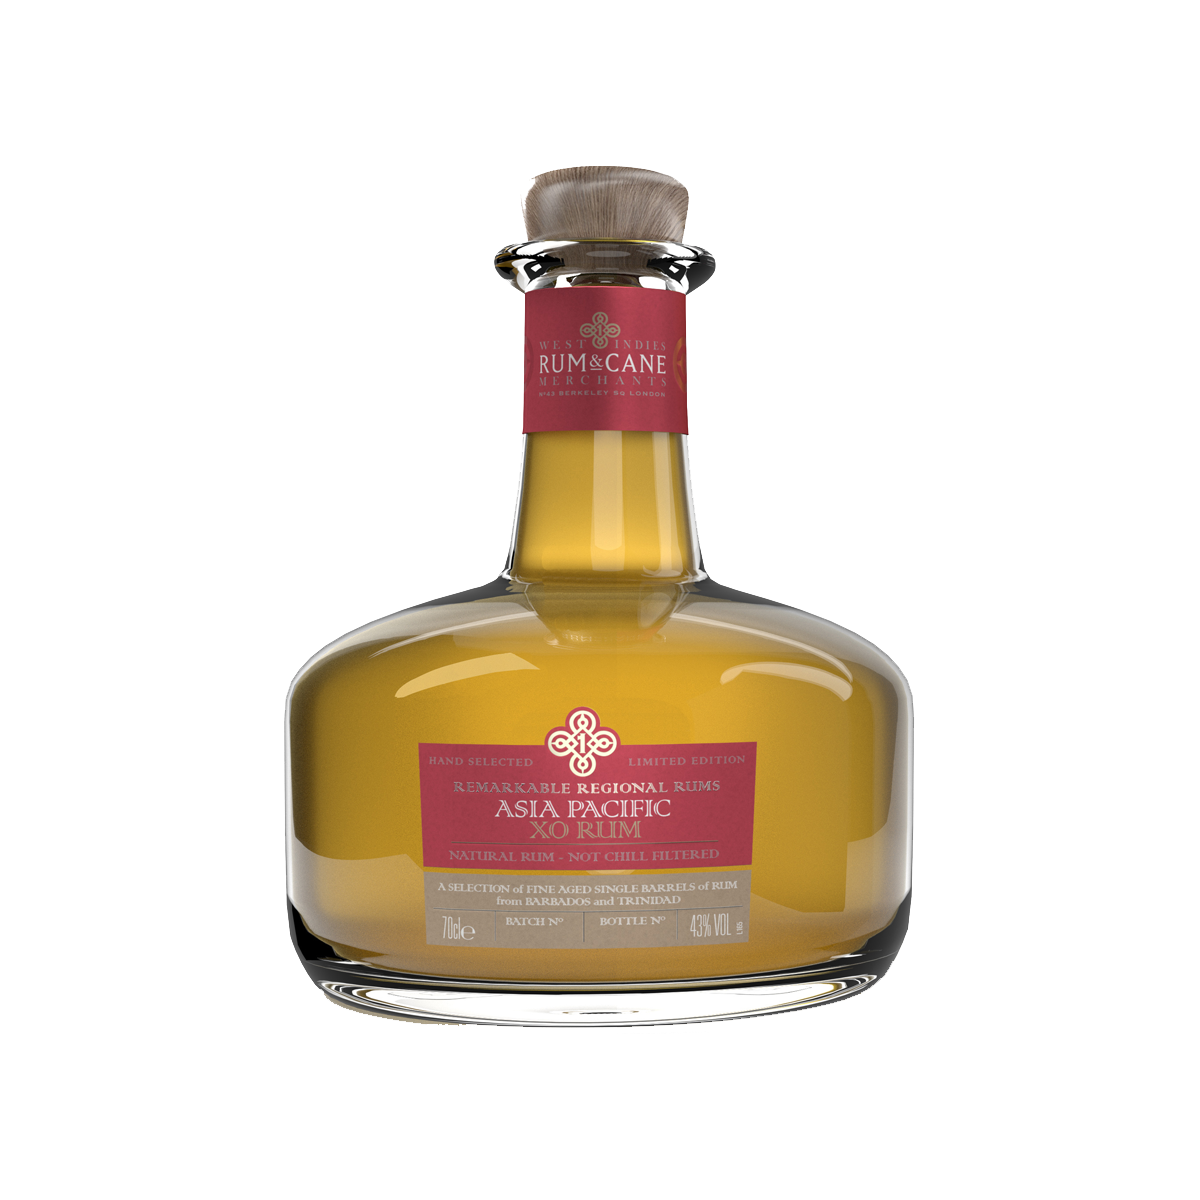 Rum & Cane Asia Pacific XO Rhum 40,3%